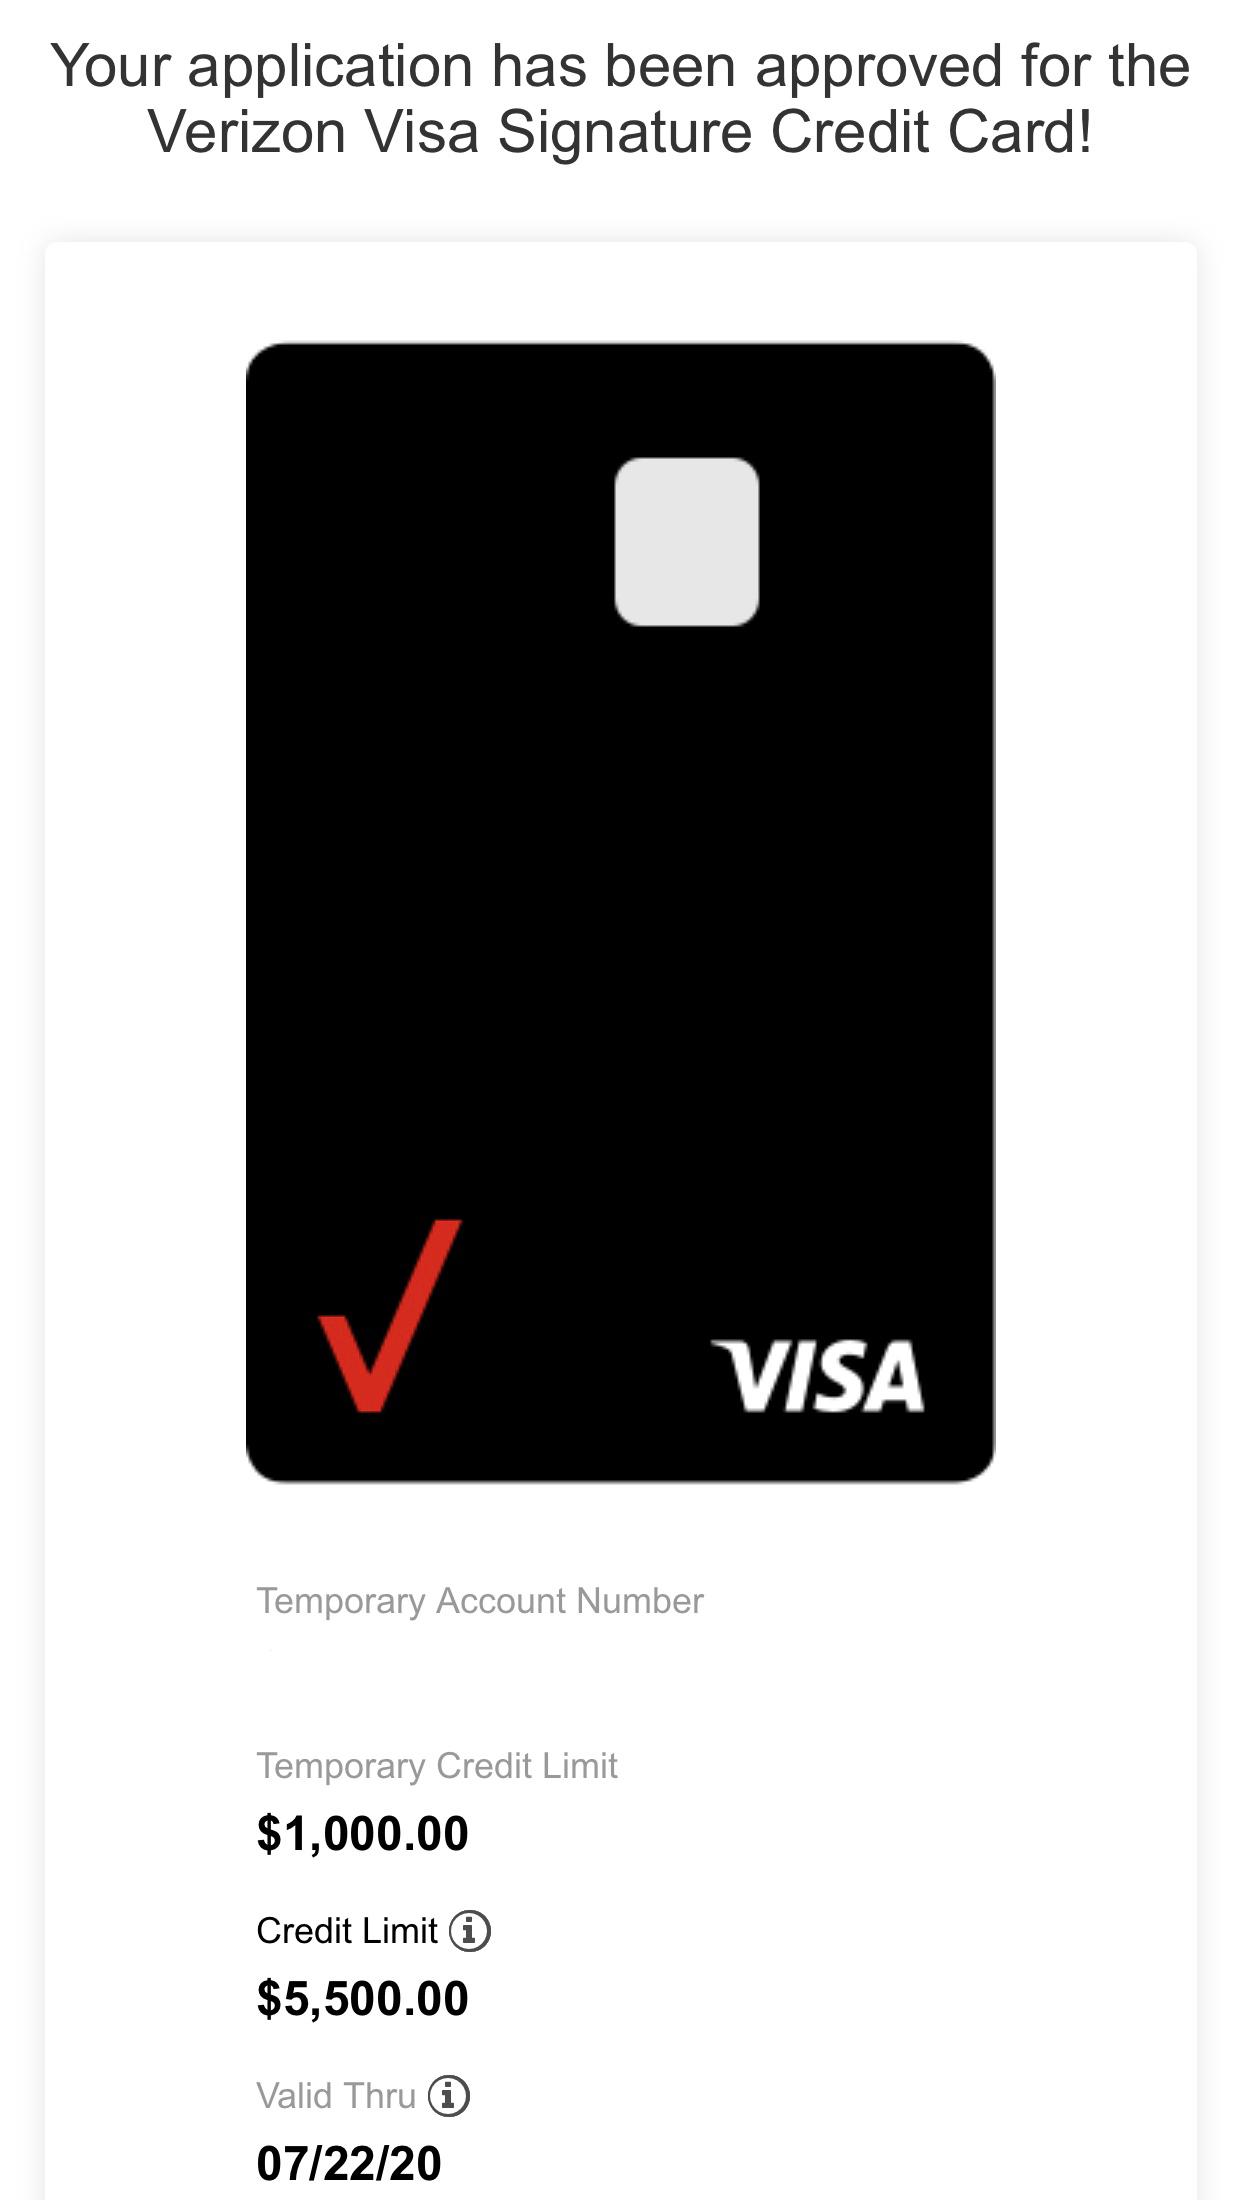 Verizon Visa Approval$8 - myFICO® Forums - 8